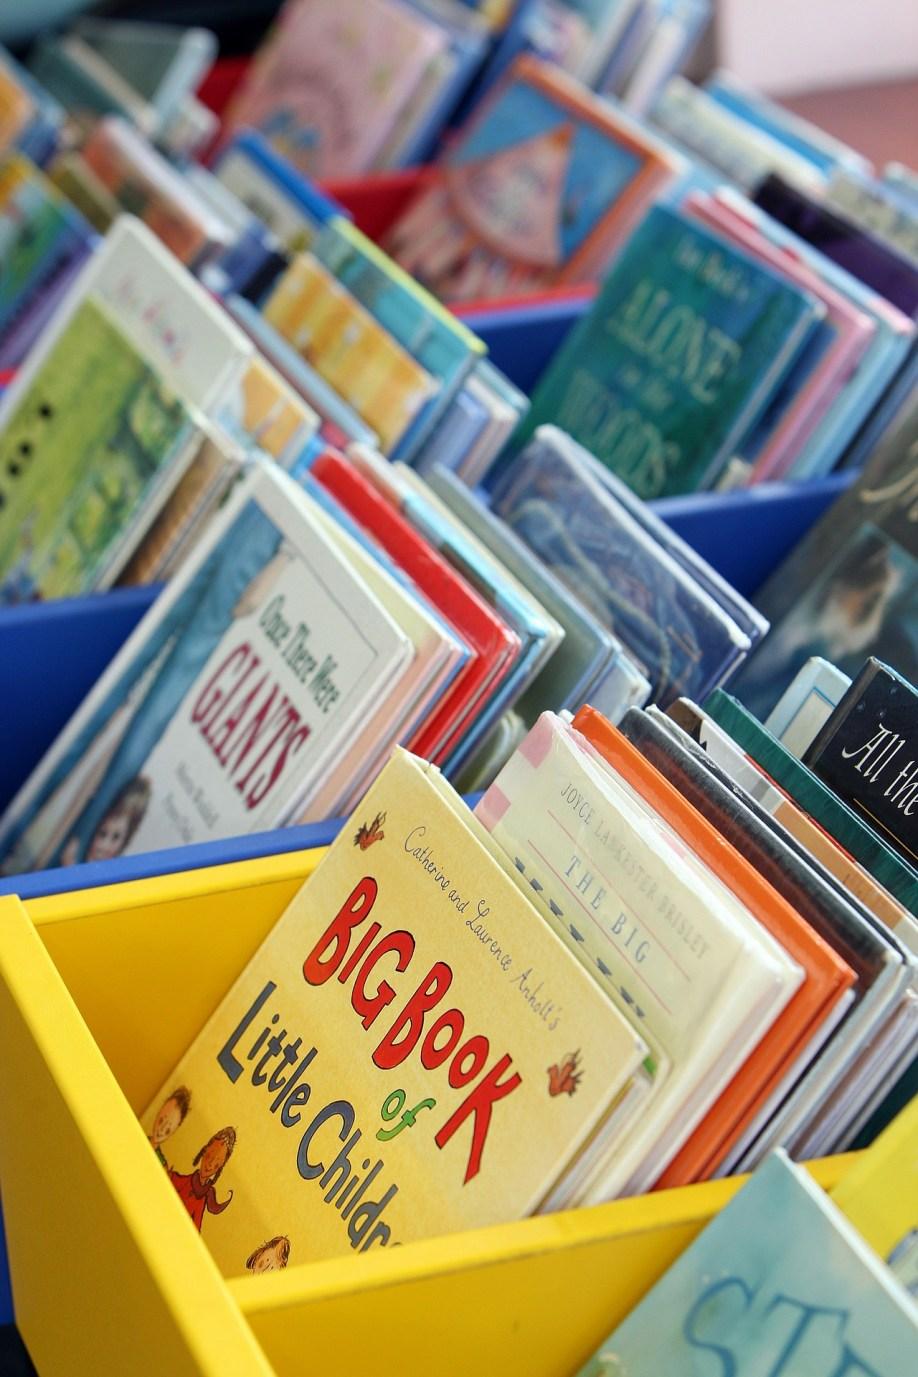 hvordan granske bokmarkedet